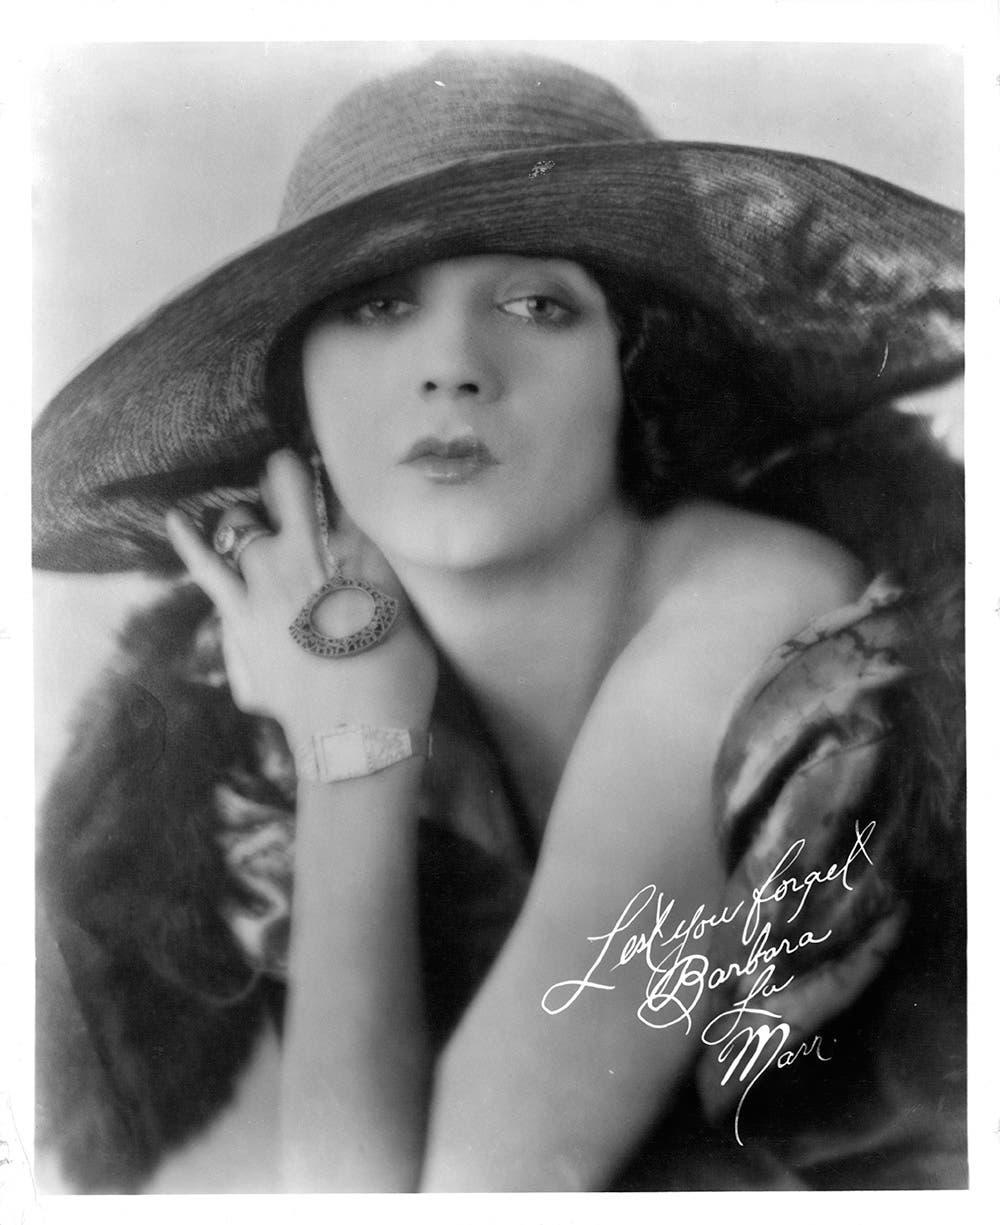 Ana Villafane,AzMarie Livingston Sex photos Kimberly Matula,Mollie Sugden (1922?009)